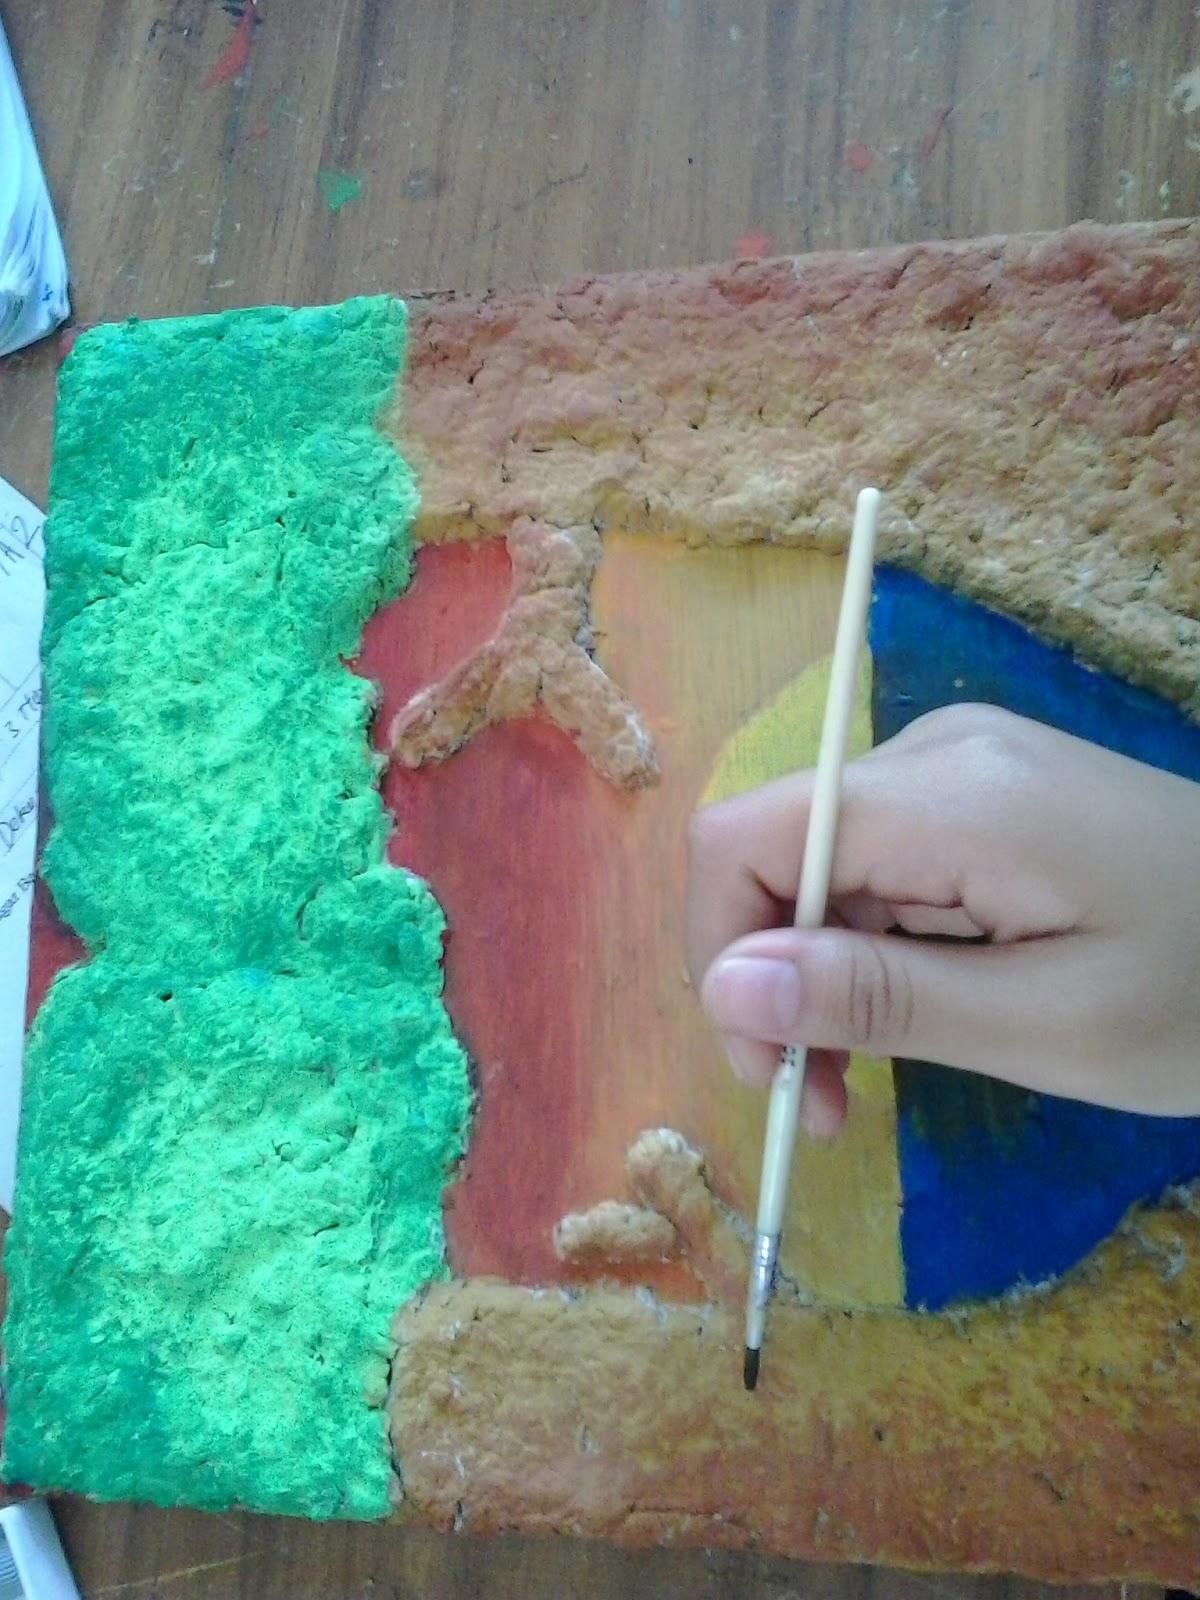 Contoh Kerajinan Dari Bubur Kertas : contoh, kerajinan, bubur, kertas, Feature:, Membuat, Kerajinan, Bubur, Kertas